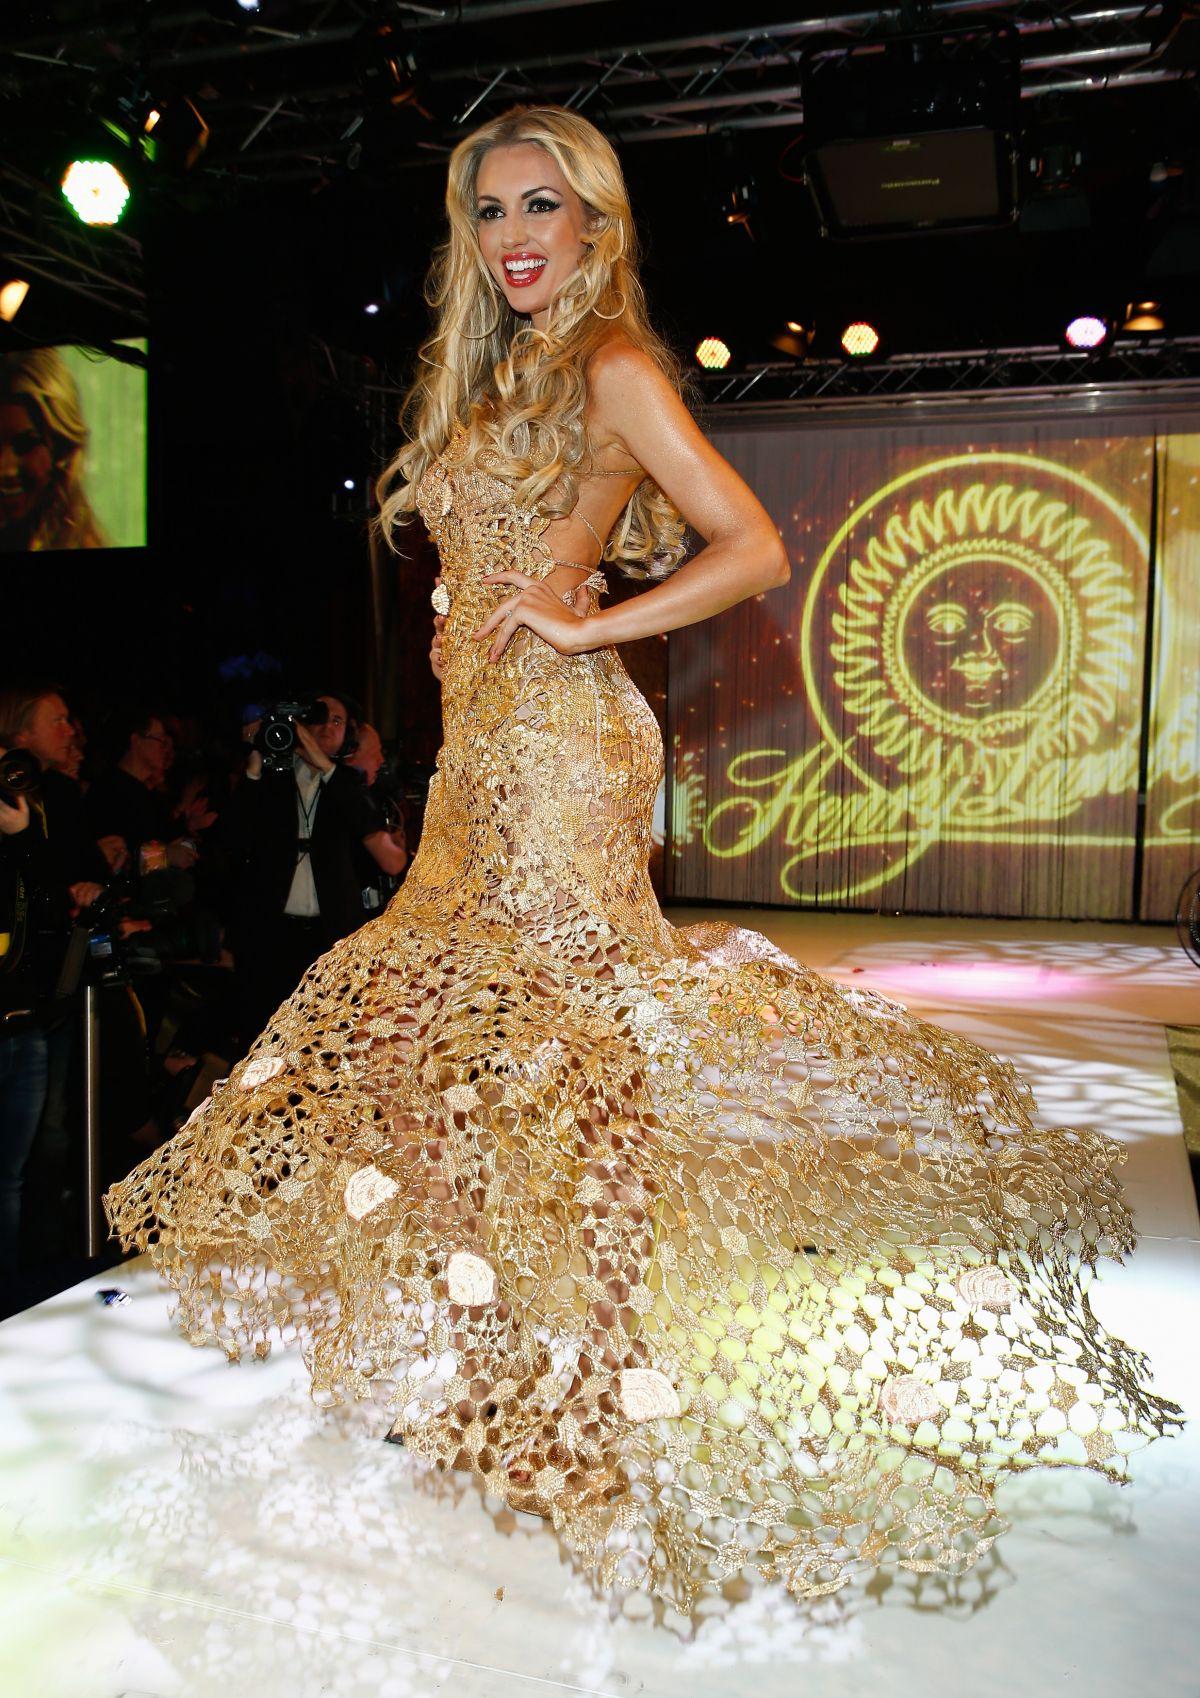 rosanna davison, miss world 2003. - Página 4 Rosanna-davison-at-lambertz-monday-night-in-cologne_6